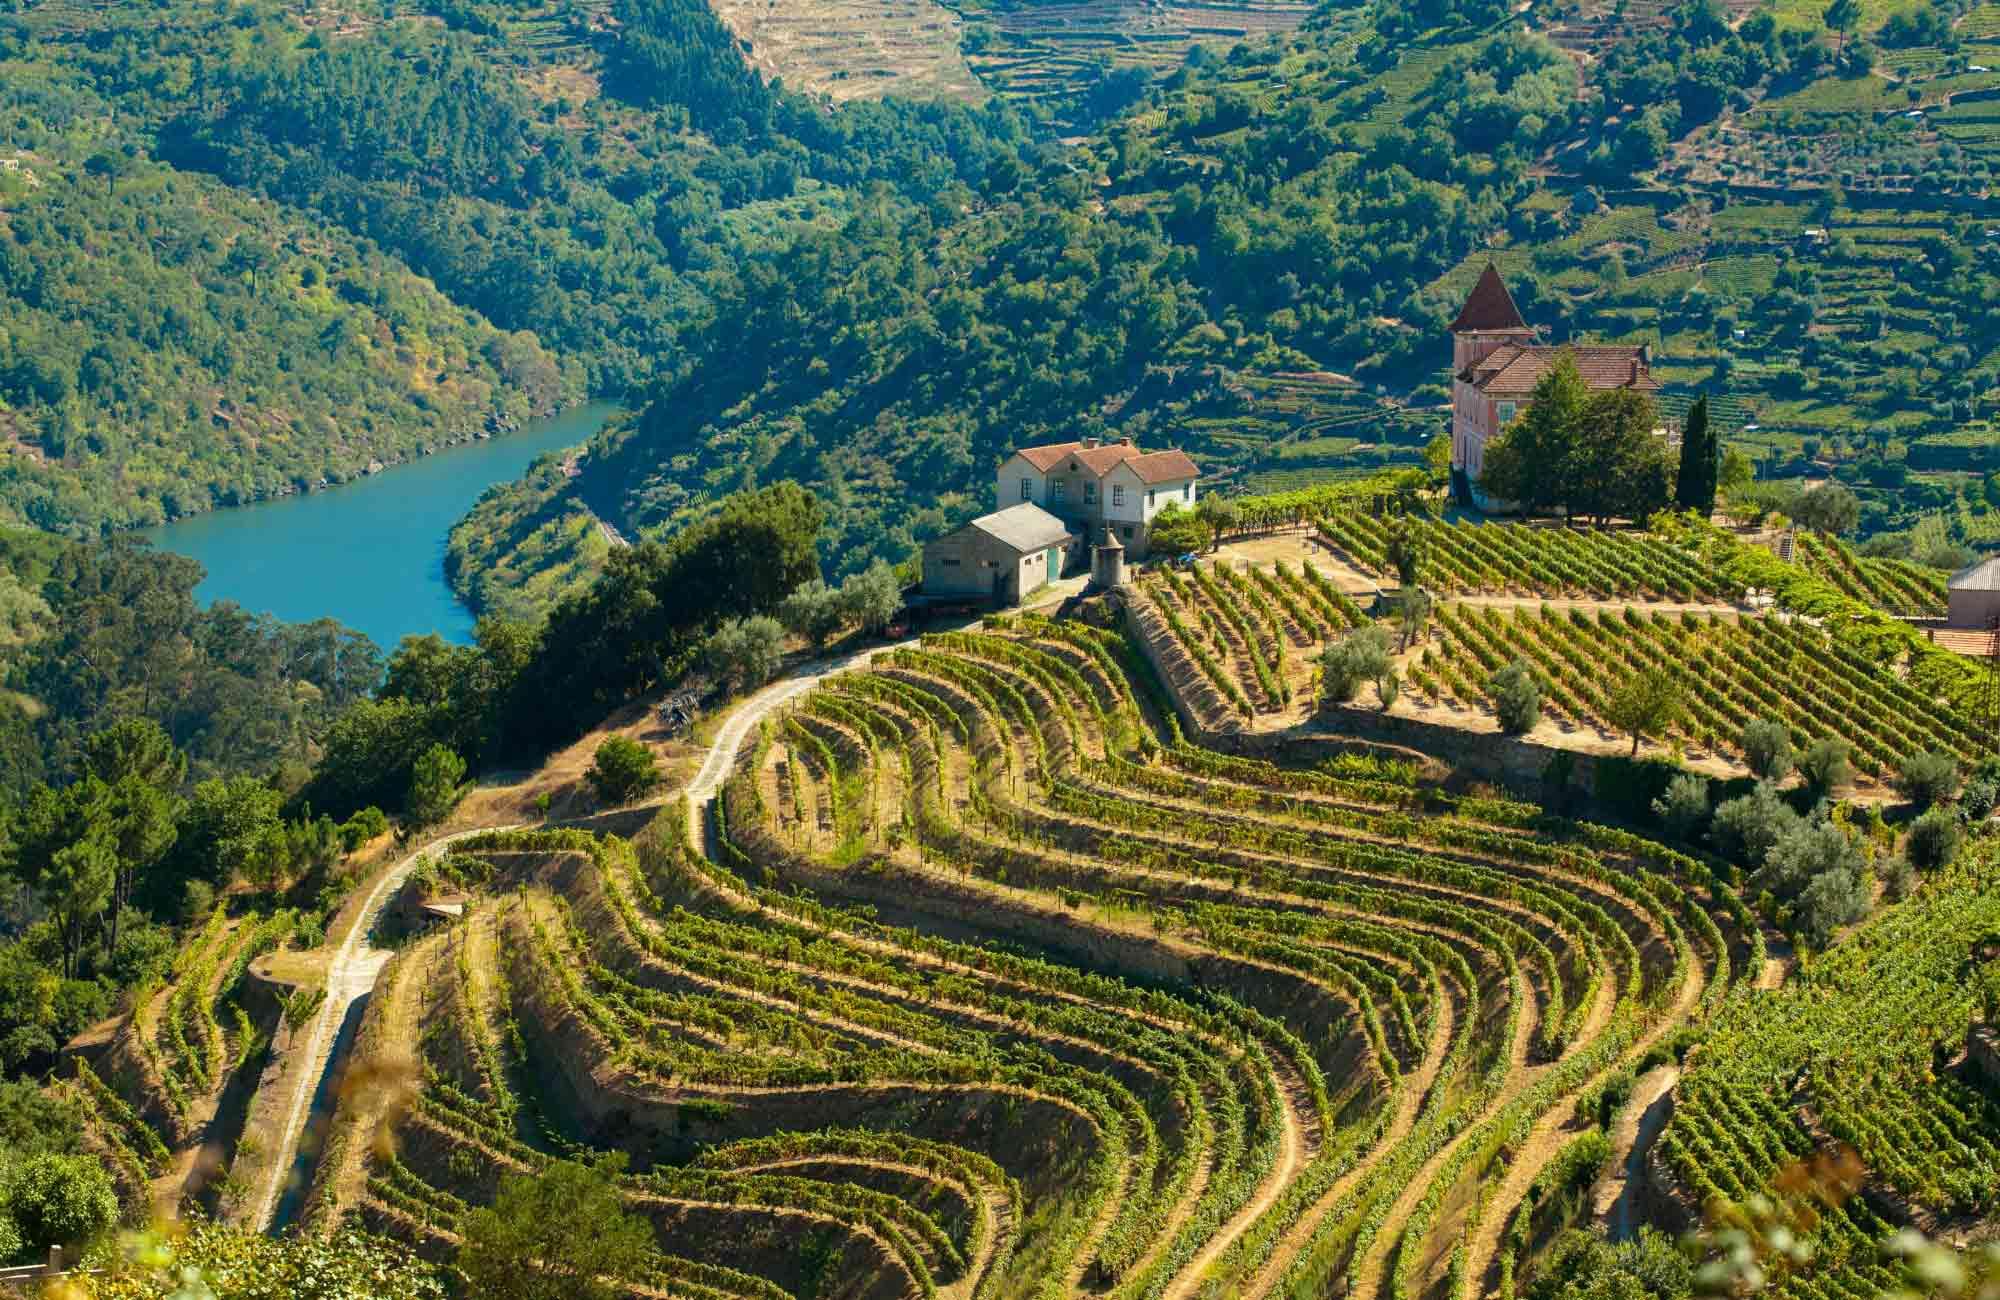 Voyage Portugal - Quinta Vallée du Douro - Amplitudes